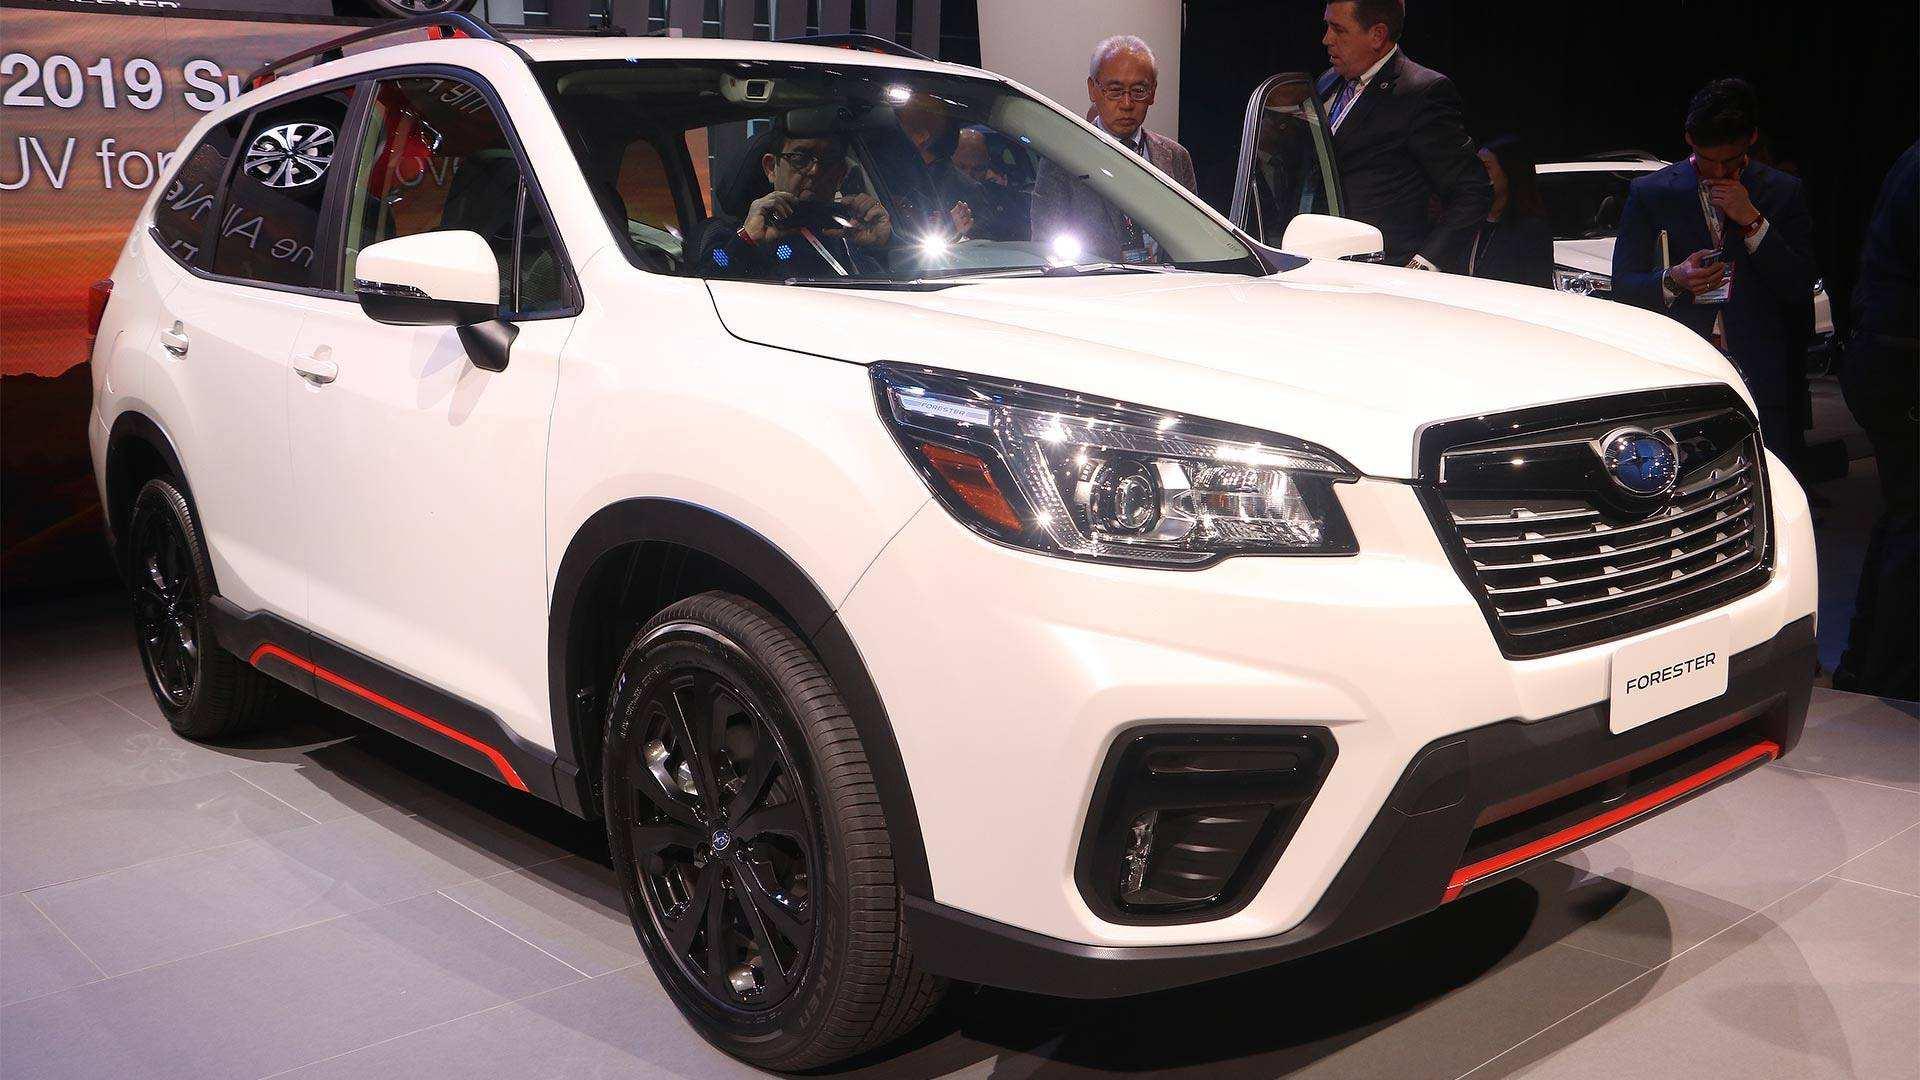 43 Gallery of 2019 Subaru Updates Ratings with 2019 Subaru Updates